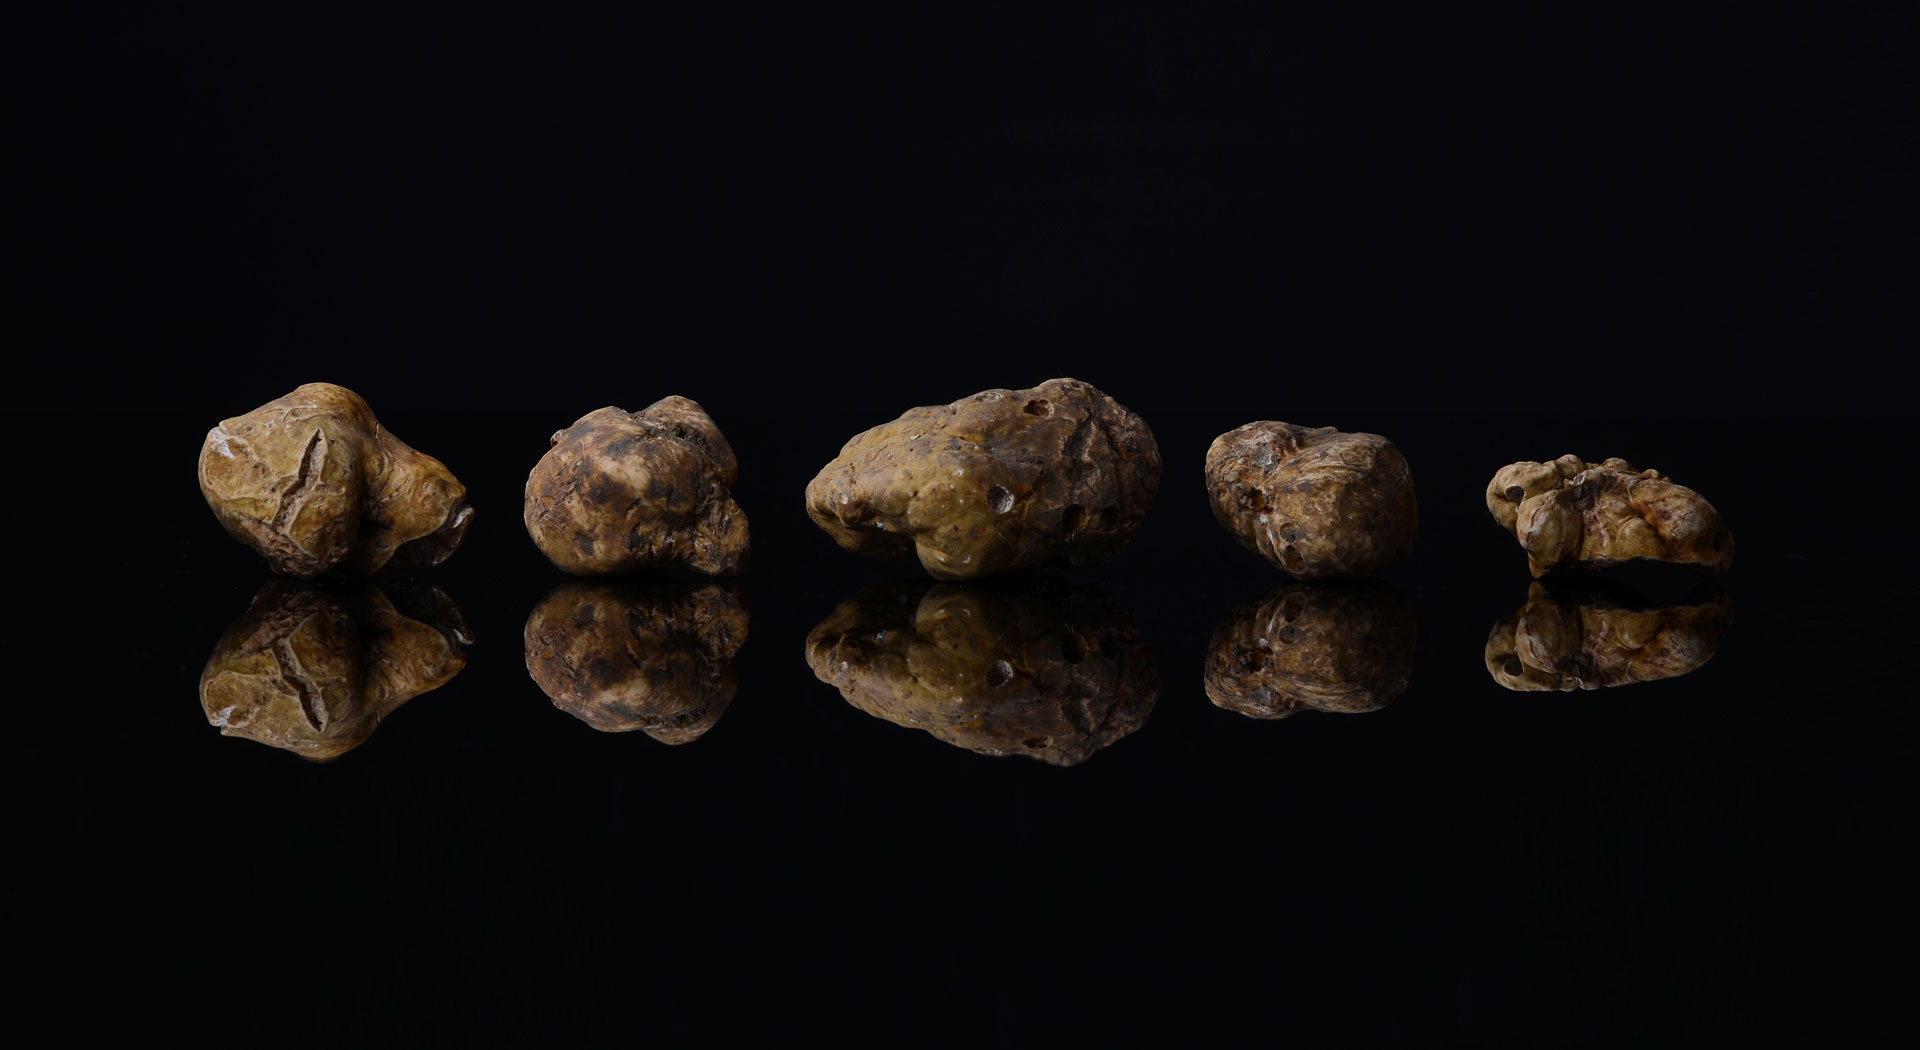 crni tartuf - prodan tartufi